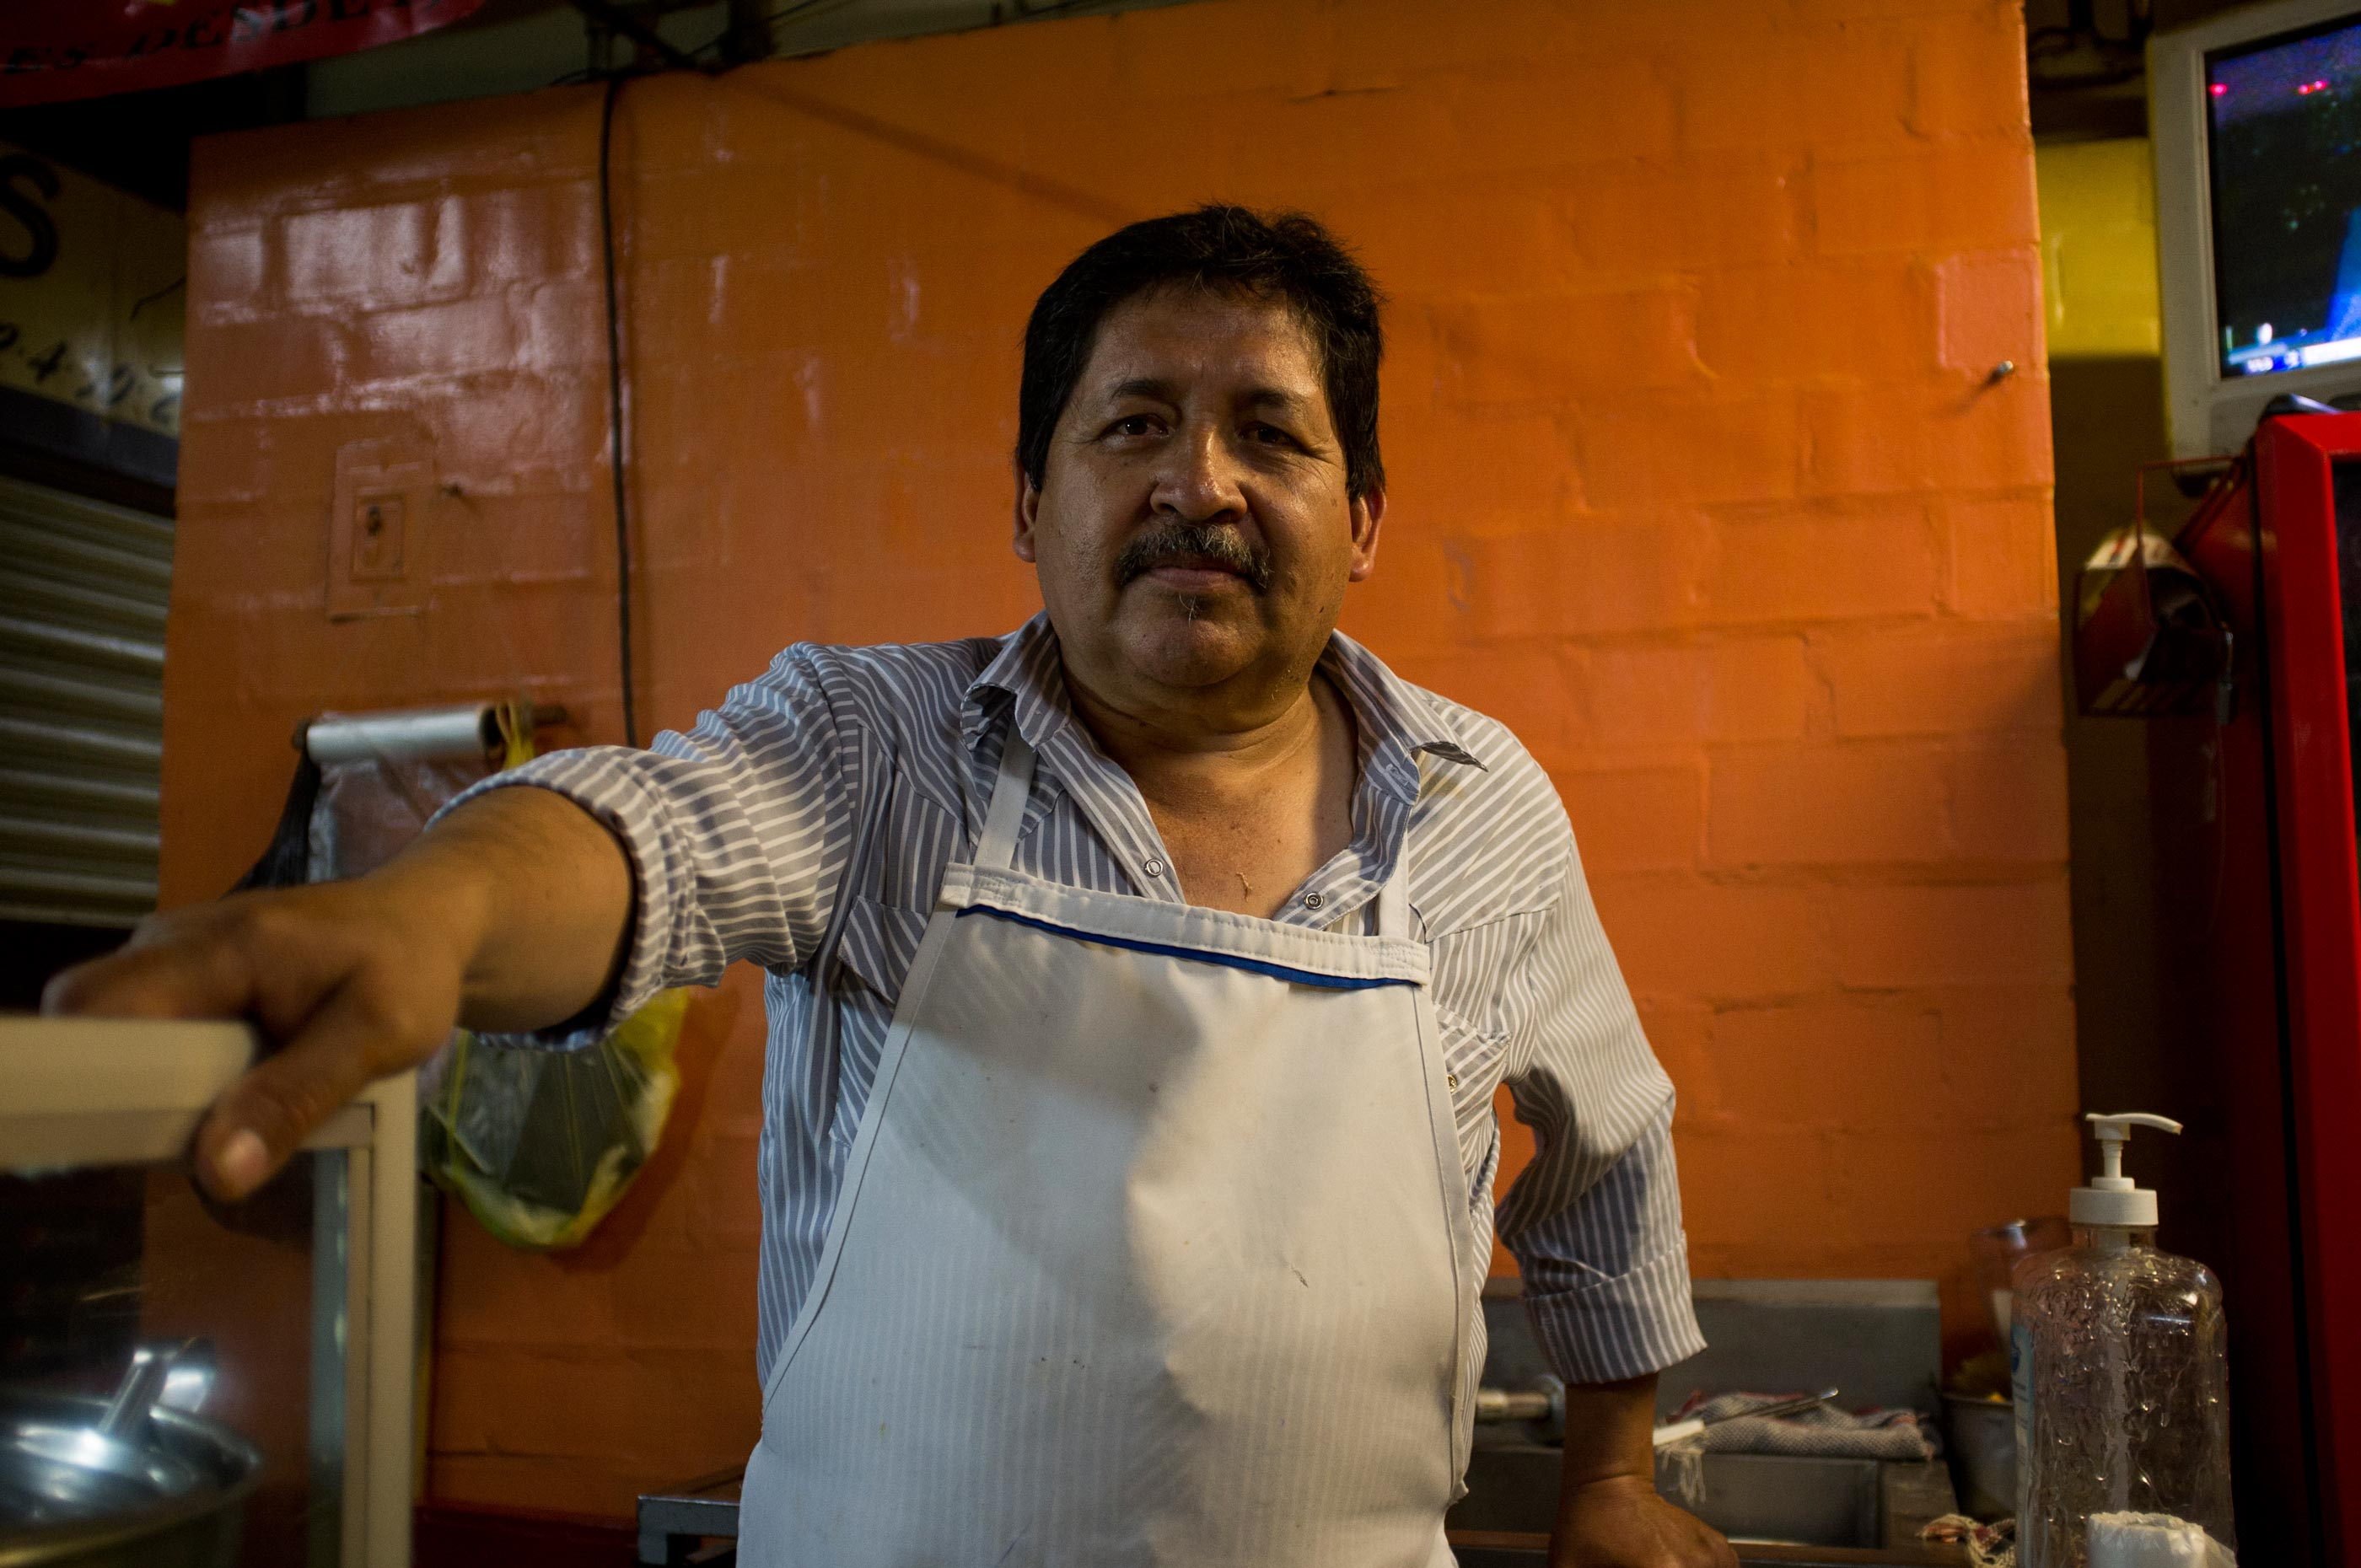 A man selling birria in Zacatecas